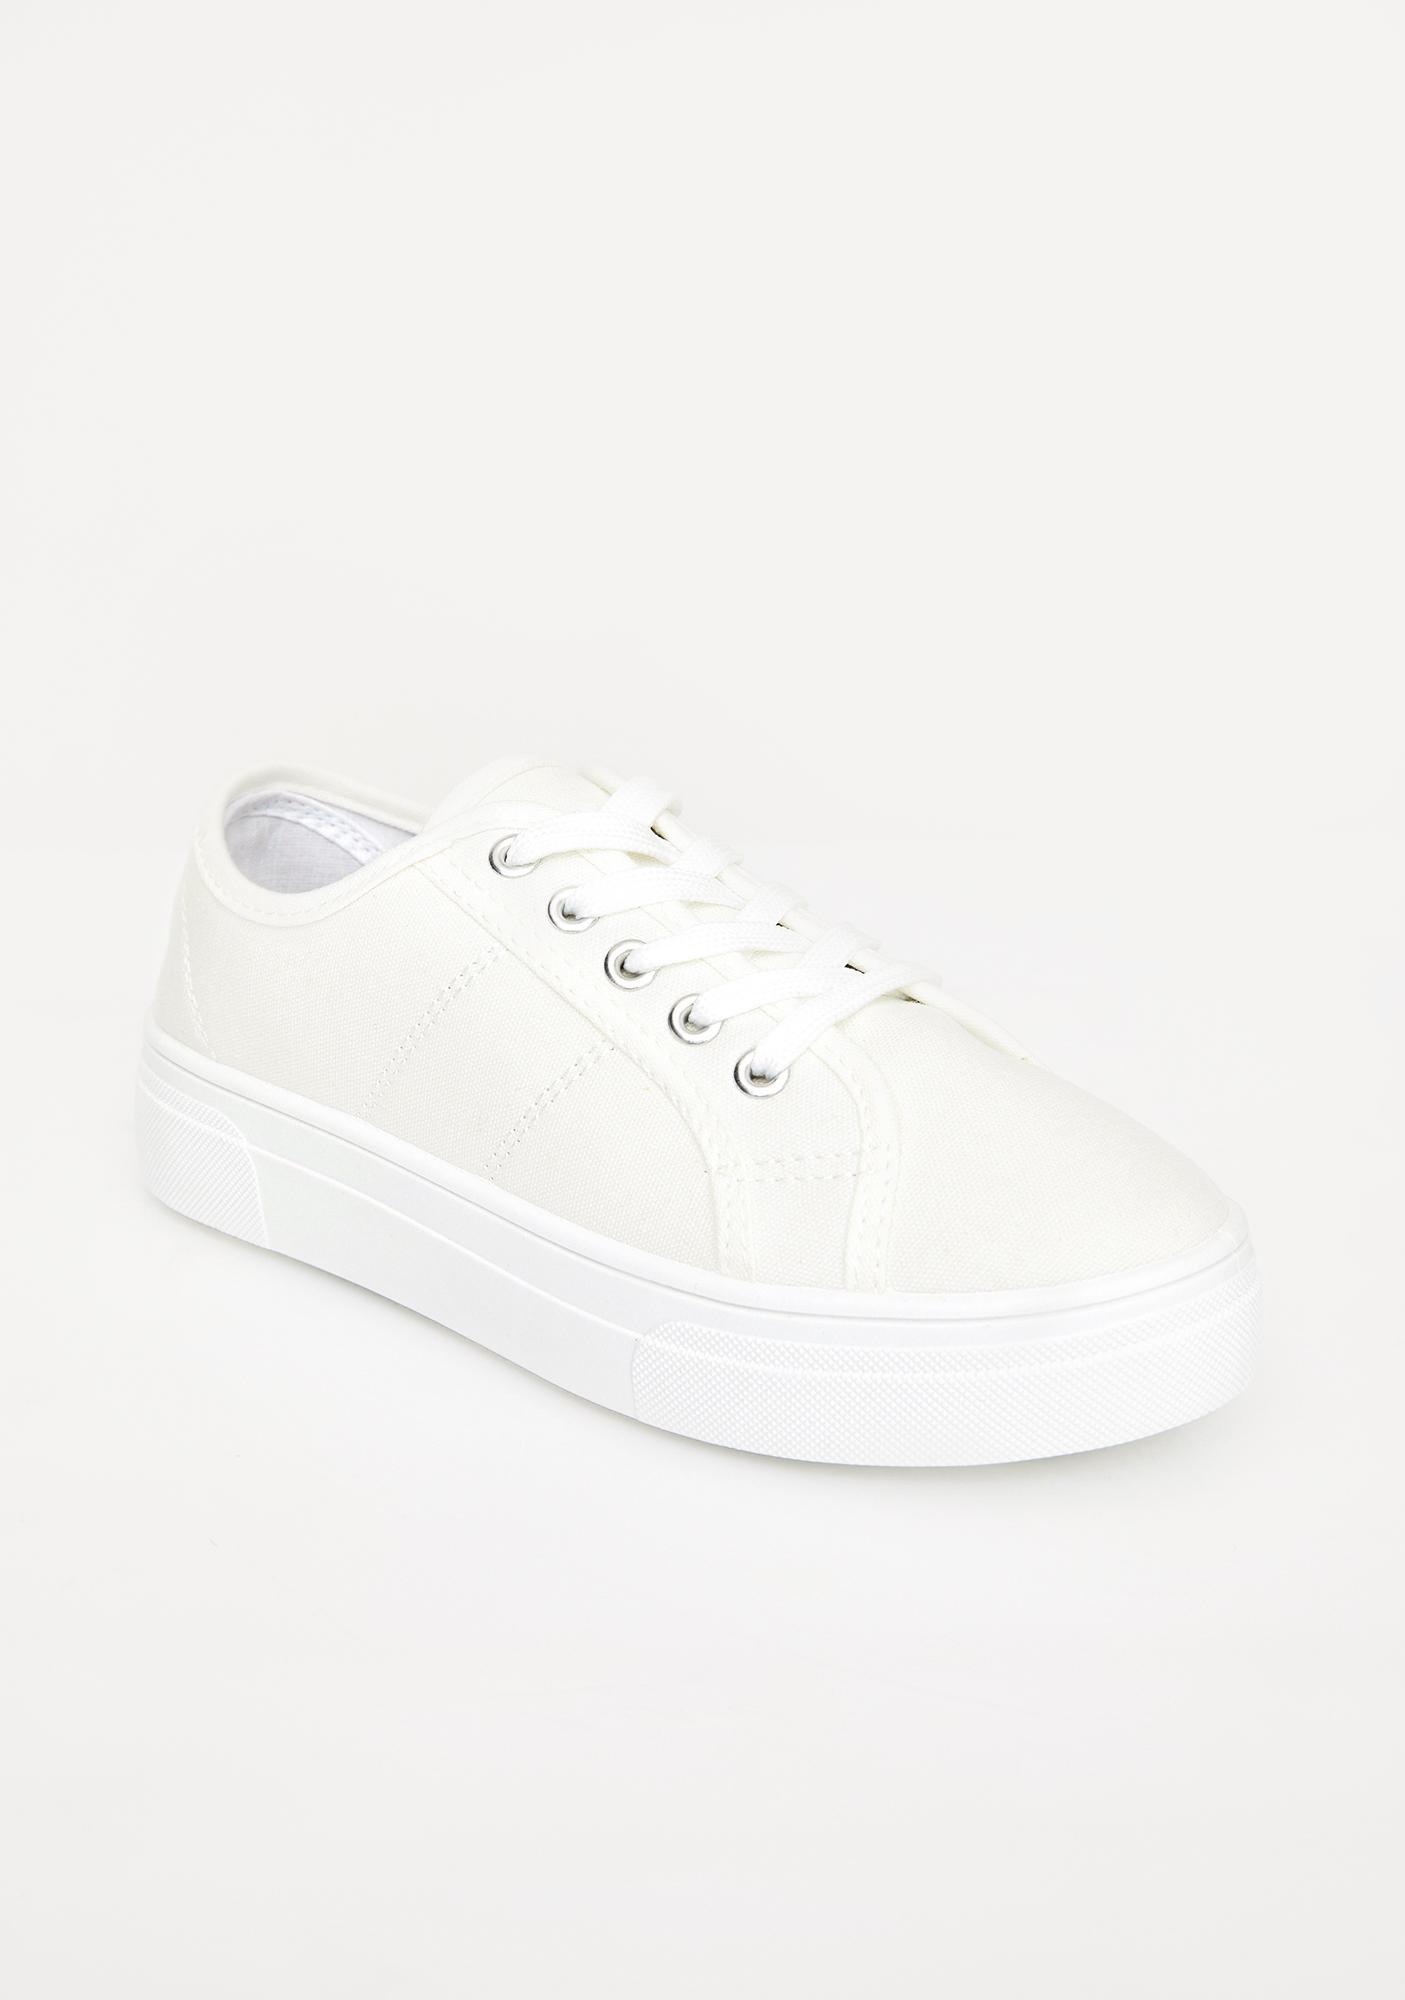 Keep It Cute Classic Sneakers